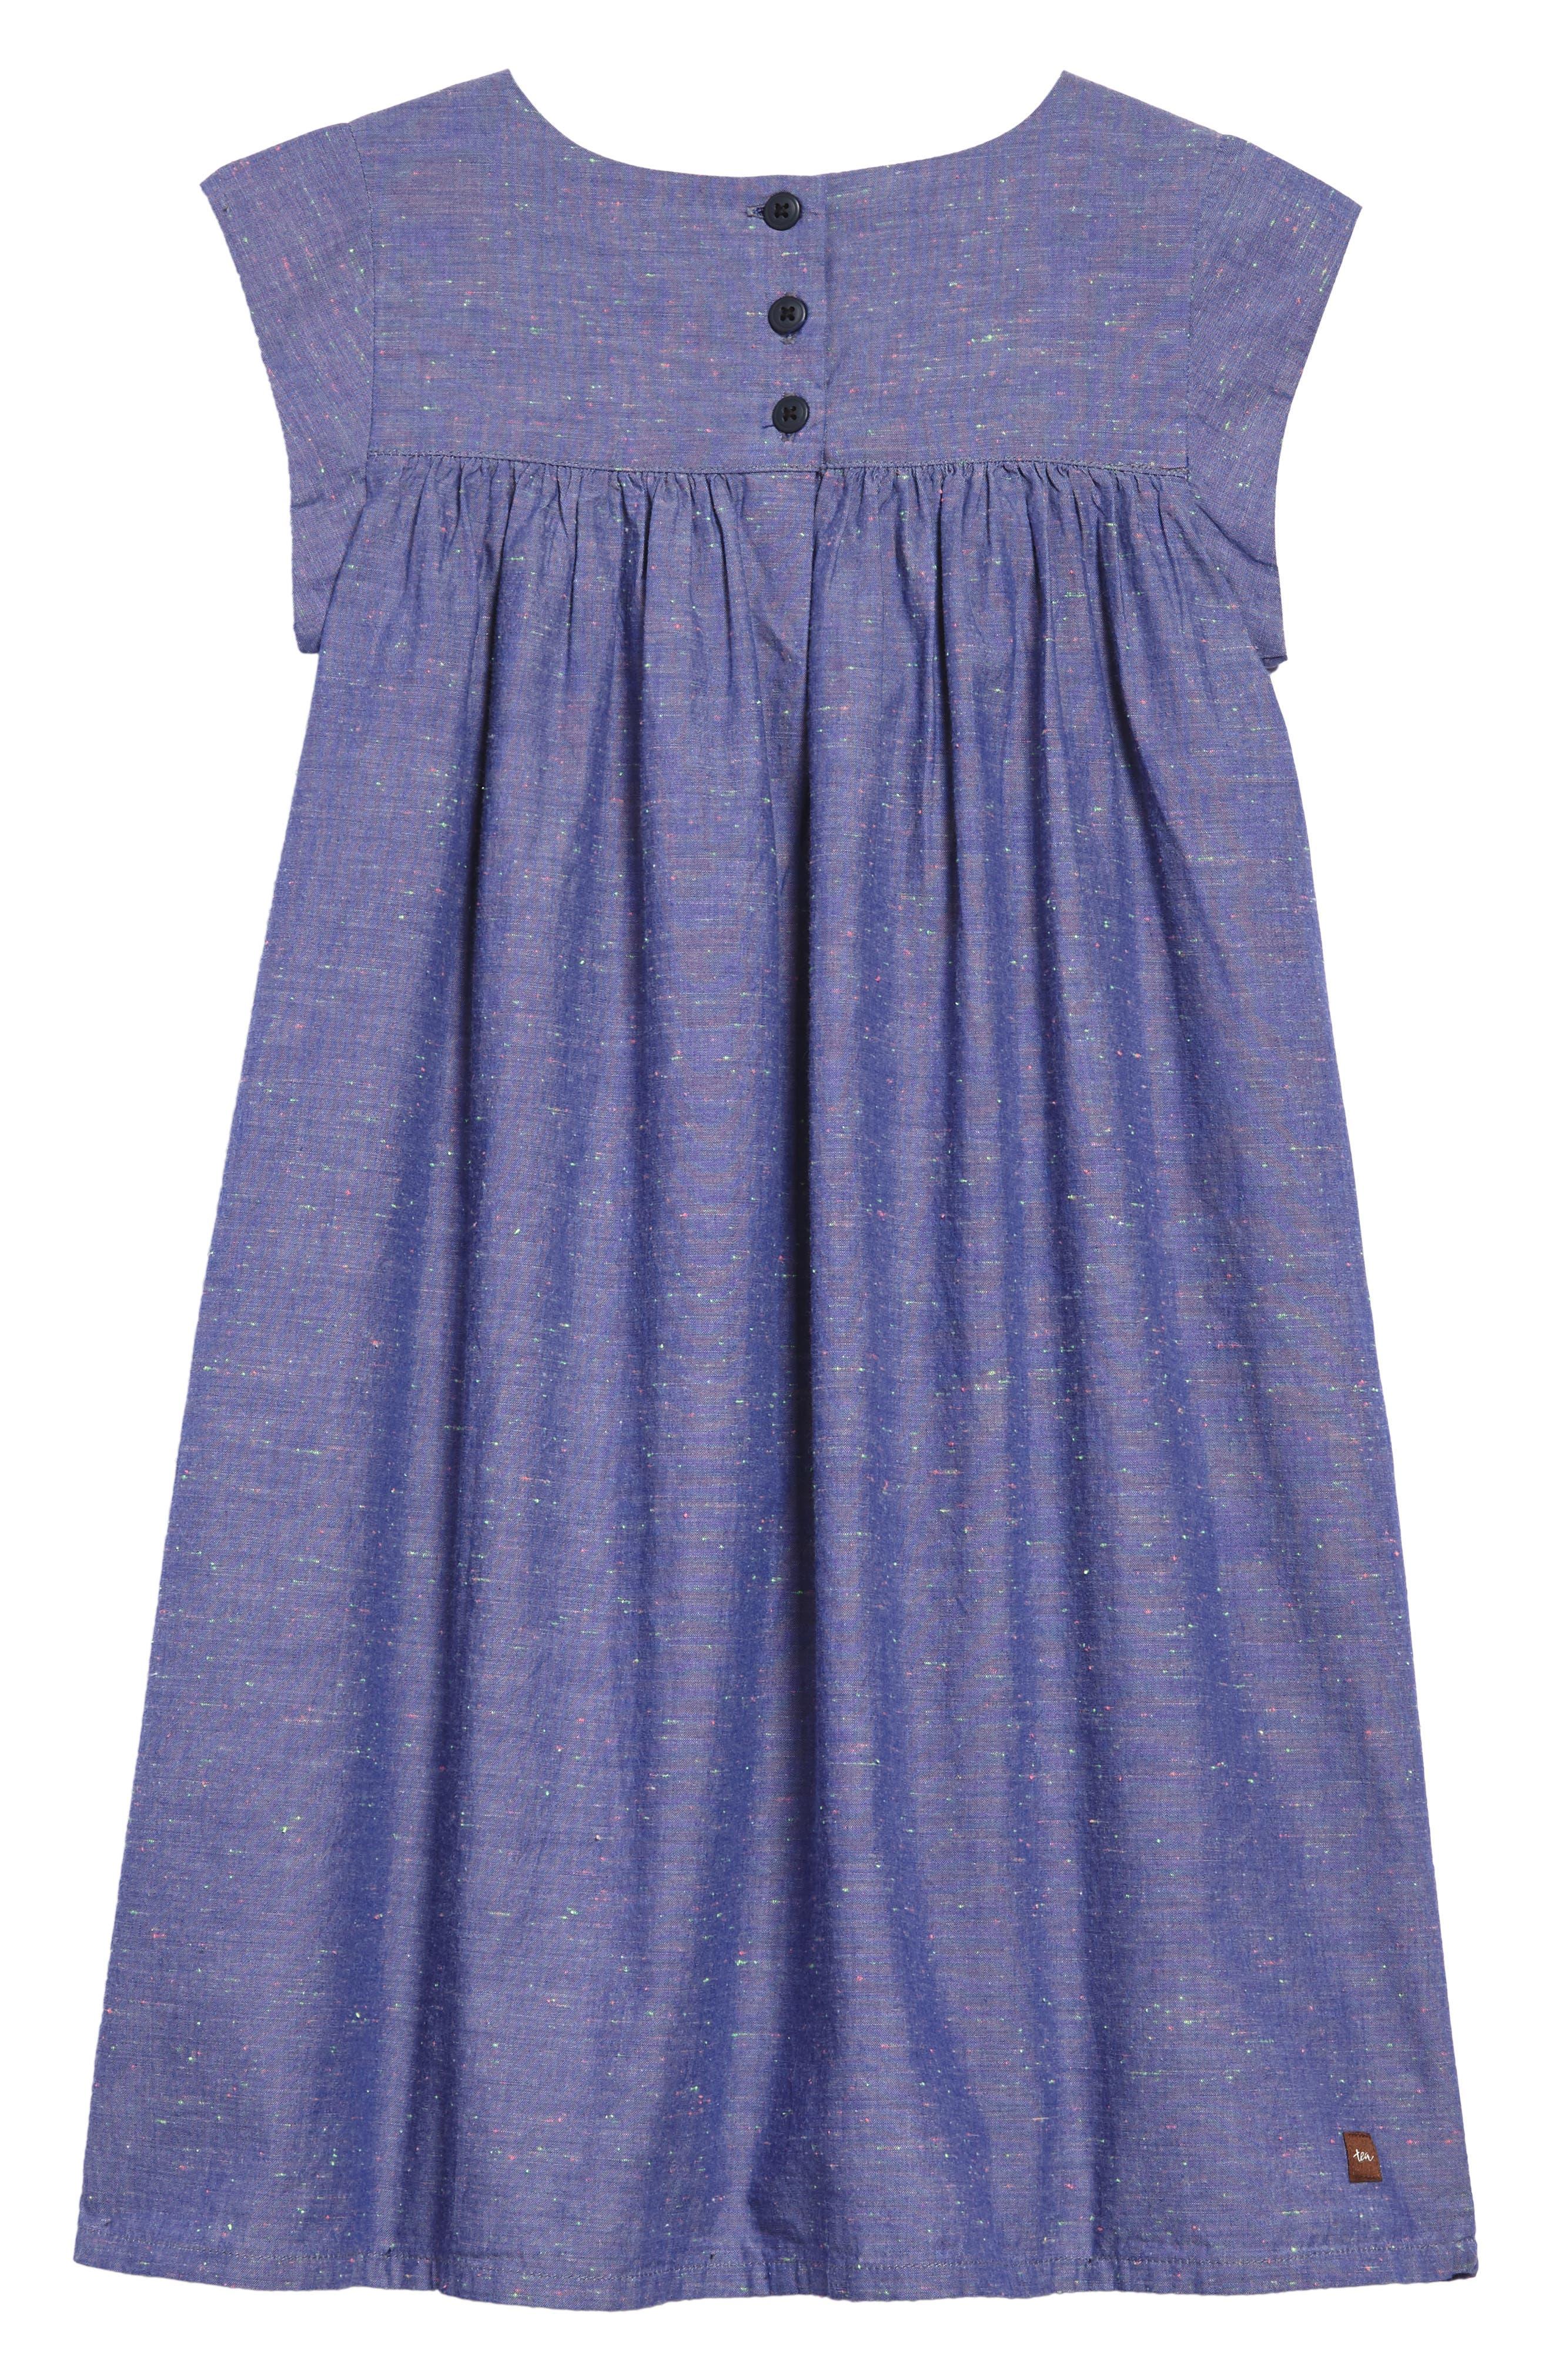 Nep Chambray Dress,                             Alternate thumbnail 2, color,